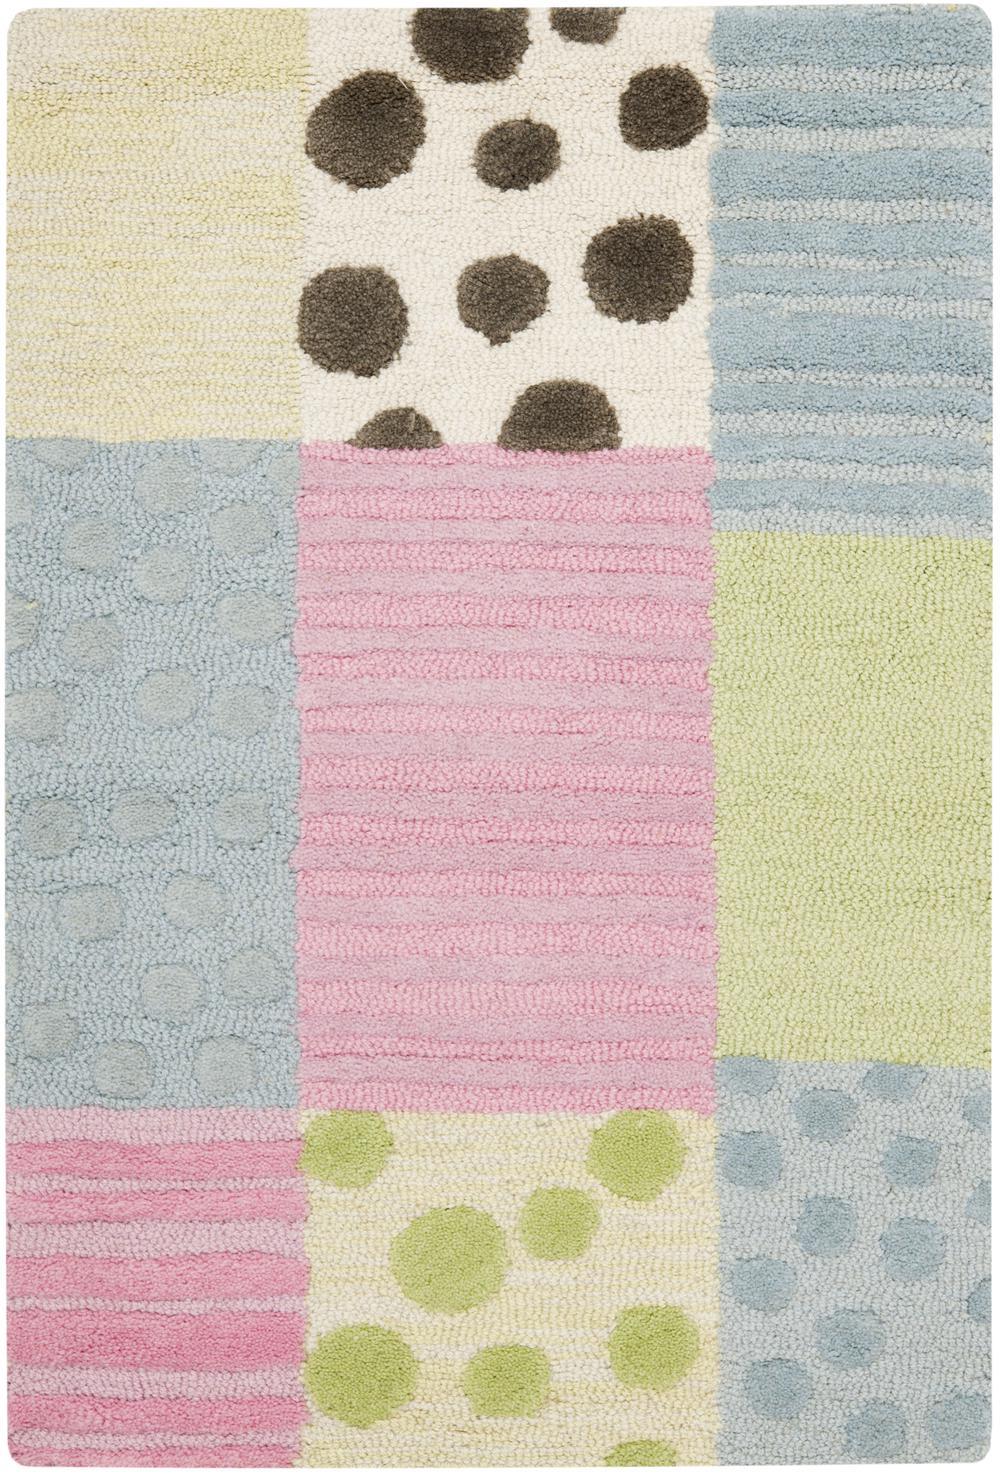 safavieh safavieh kids sfk322a blue and pink area rug bold rugs. Black Bedroom Furniture Sets. Home Design Ideas